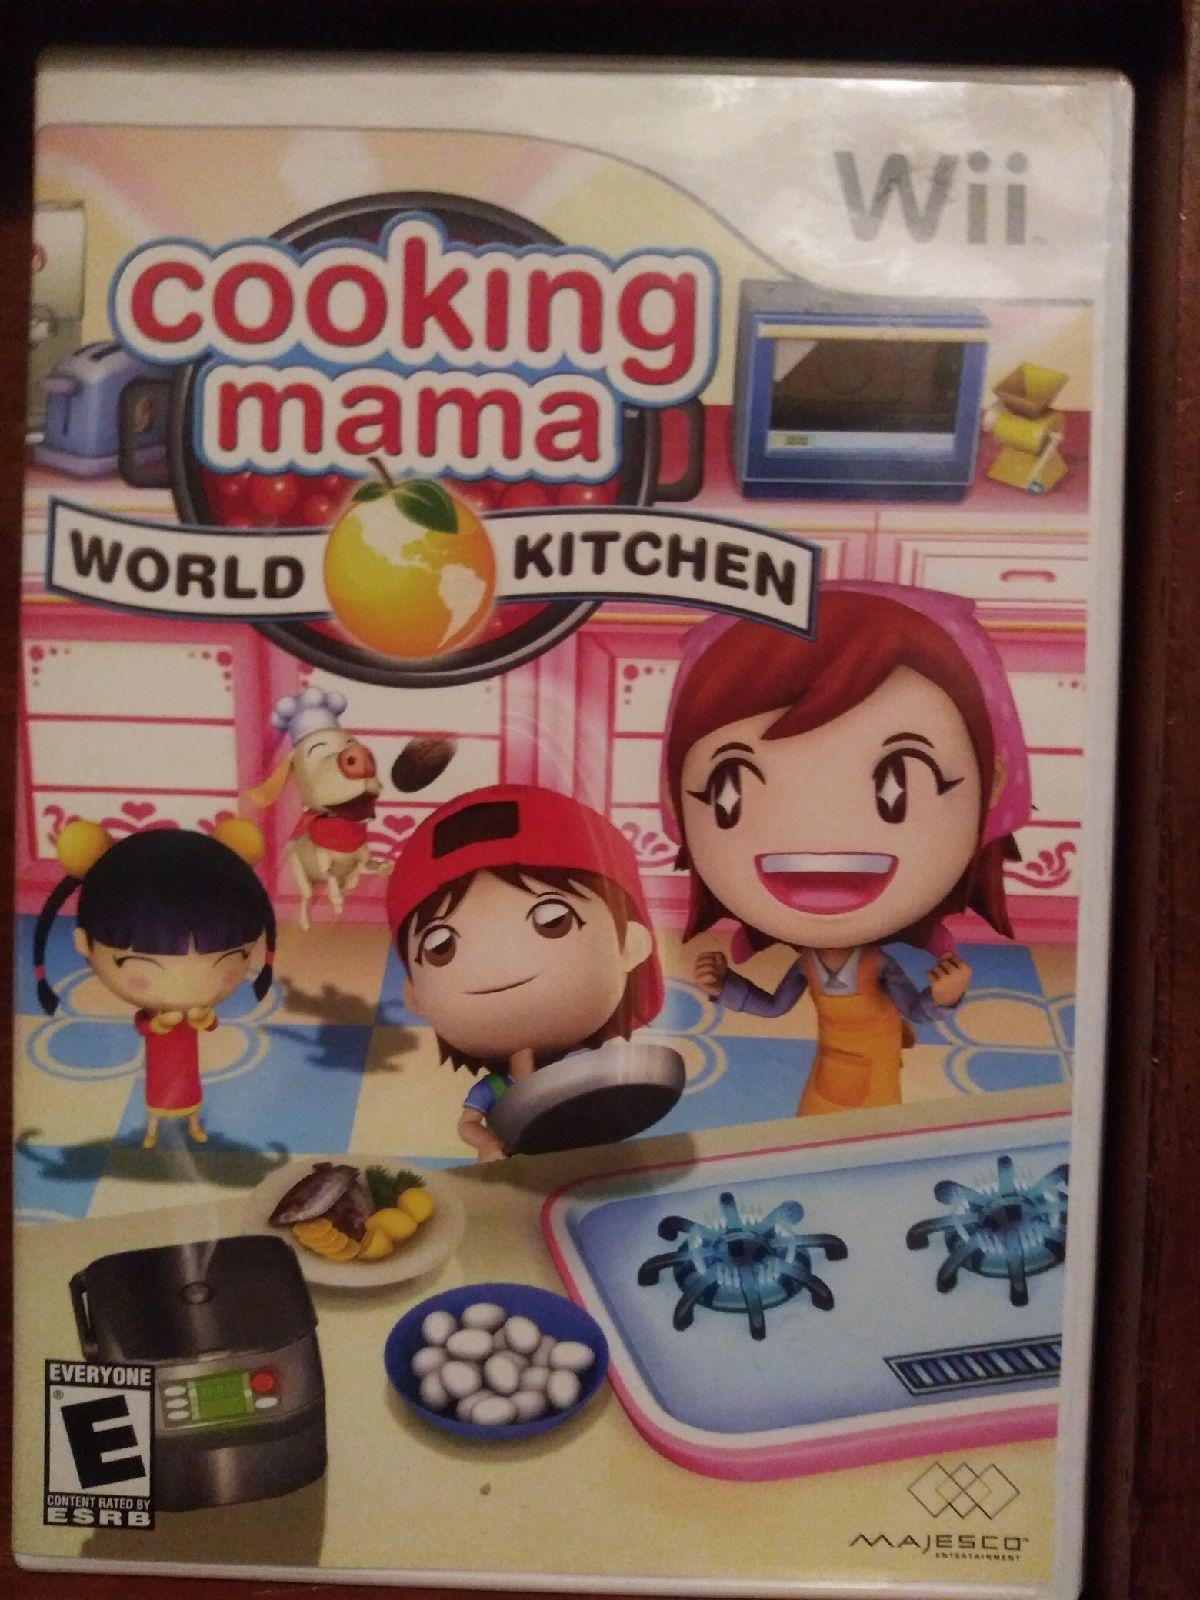 Cooking Mama World Kitchen (Wii) in 2020 Wii games, Wii